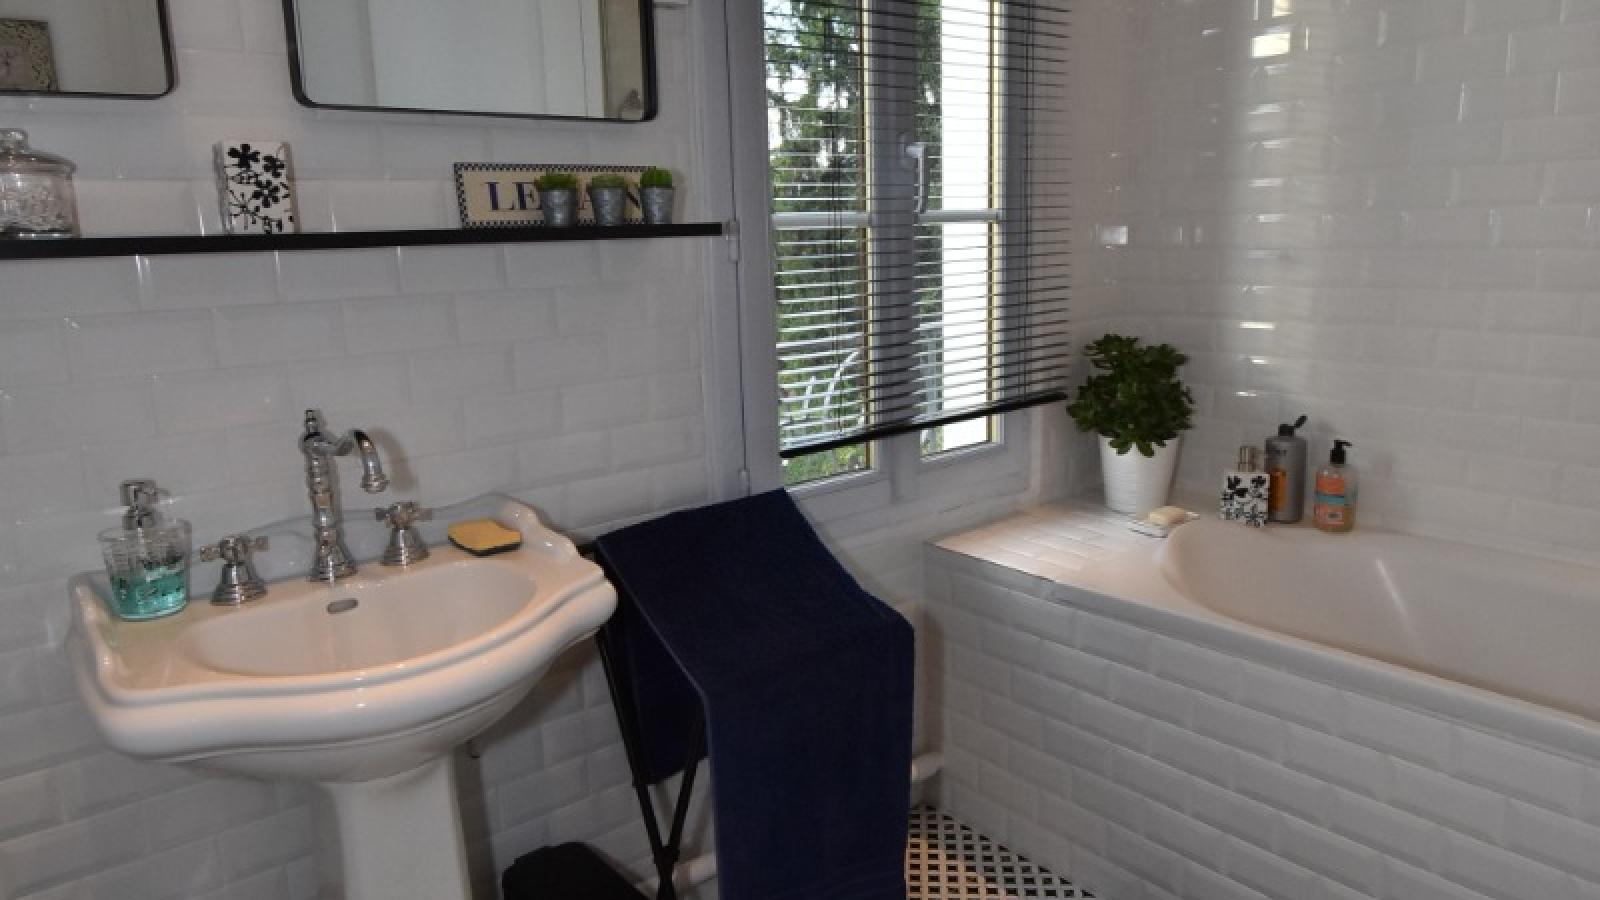 la salle de bains privative